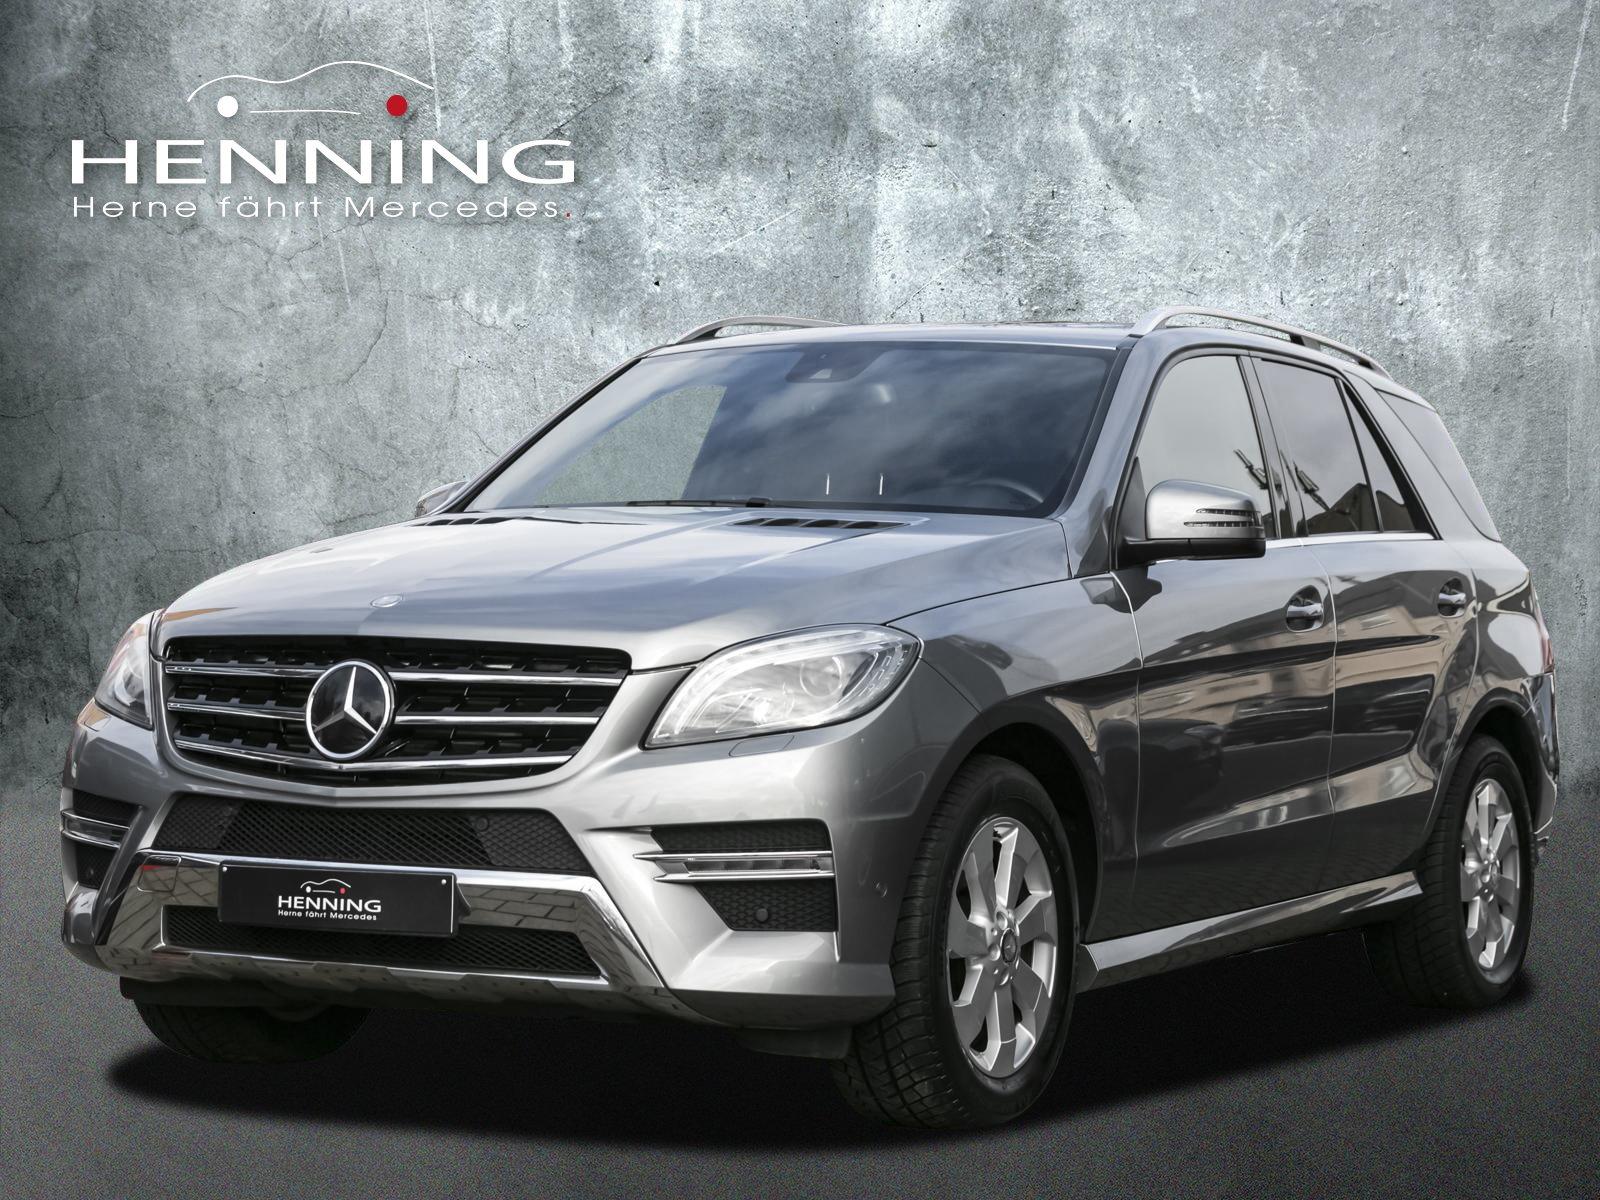 Mercedes-Benz ML 350 4Matic 7G Comand Memory Distronic+ Totw., Jahr 2013, Diesel